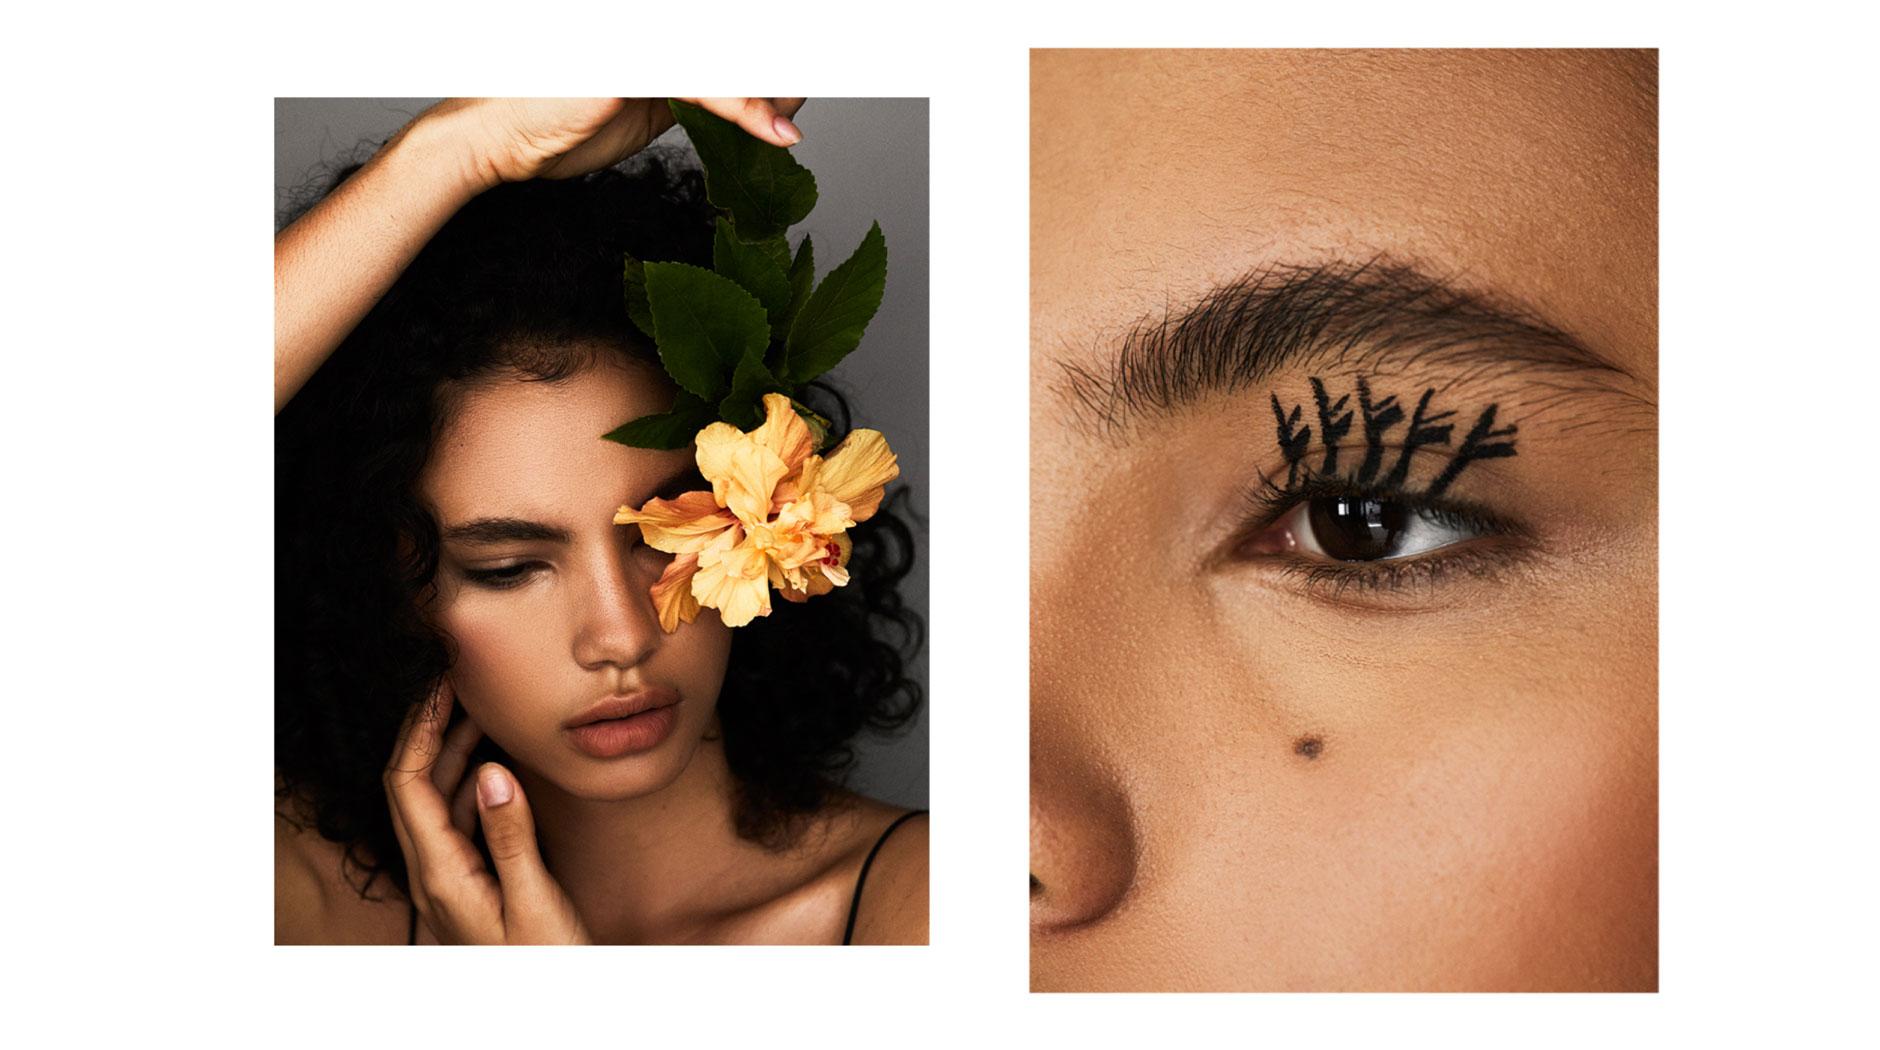 Seeds-02–LUMA—Photography.-Yukimi-Moromisato-Art-Direction-&-Styling.-Kate-Mogollón-Hair-&-Make-Up.-Debbie-Ray-Model.-Luma-Vitória-@-WeLove-Models-Perú-@amusemag-amusemag